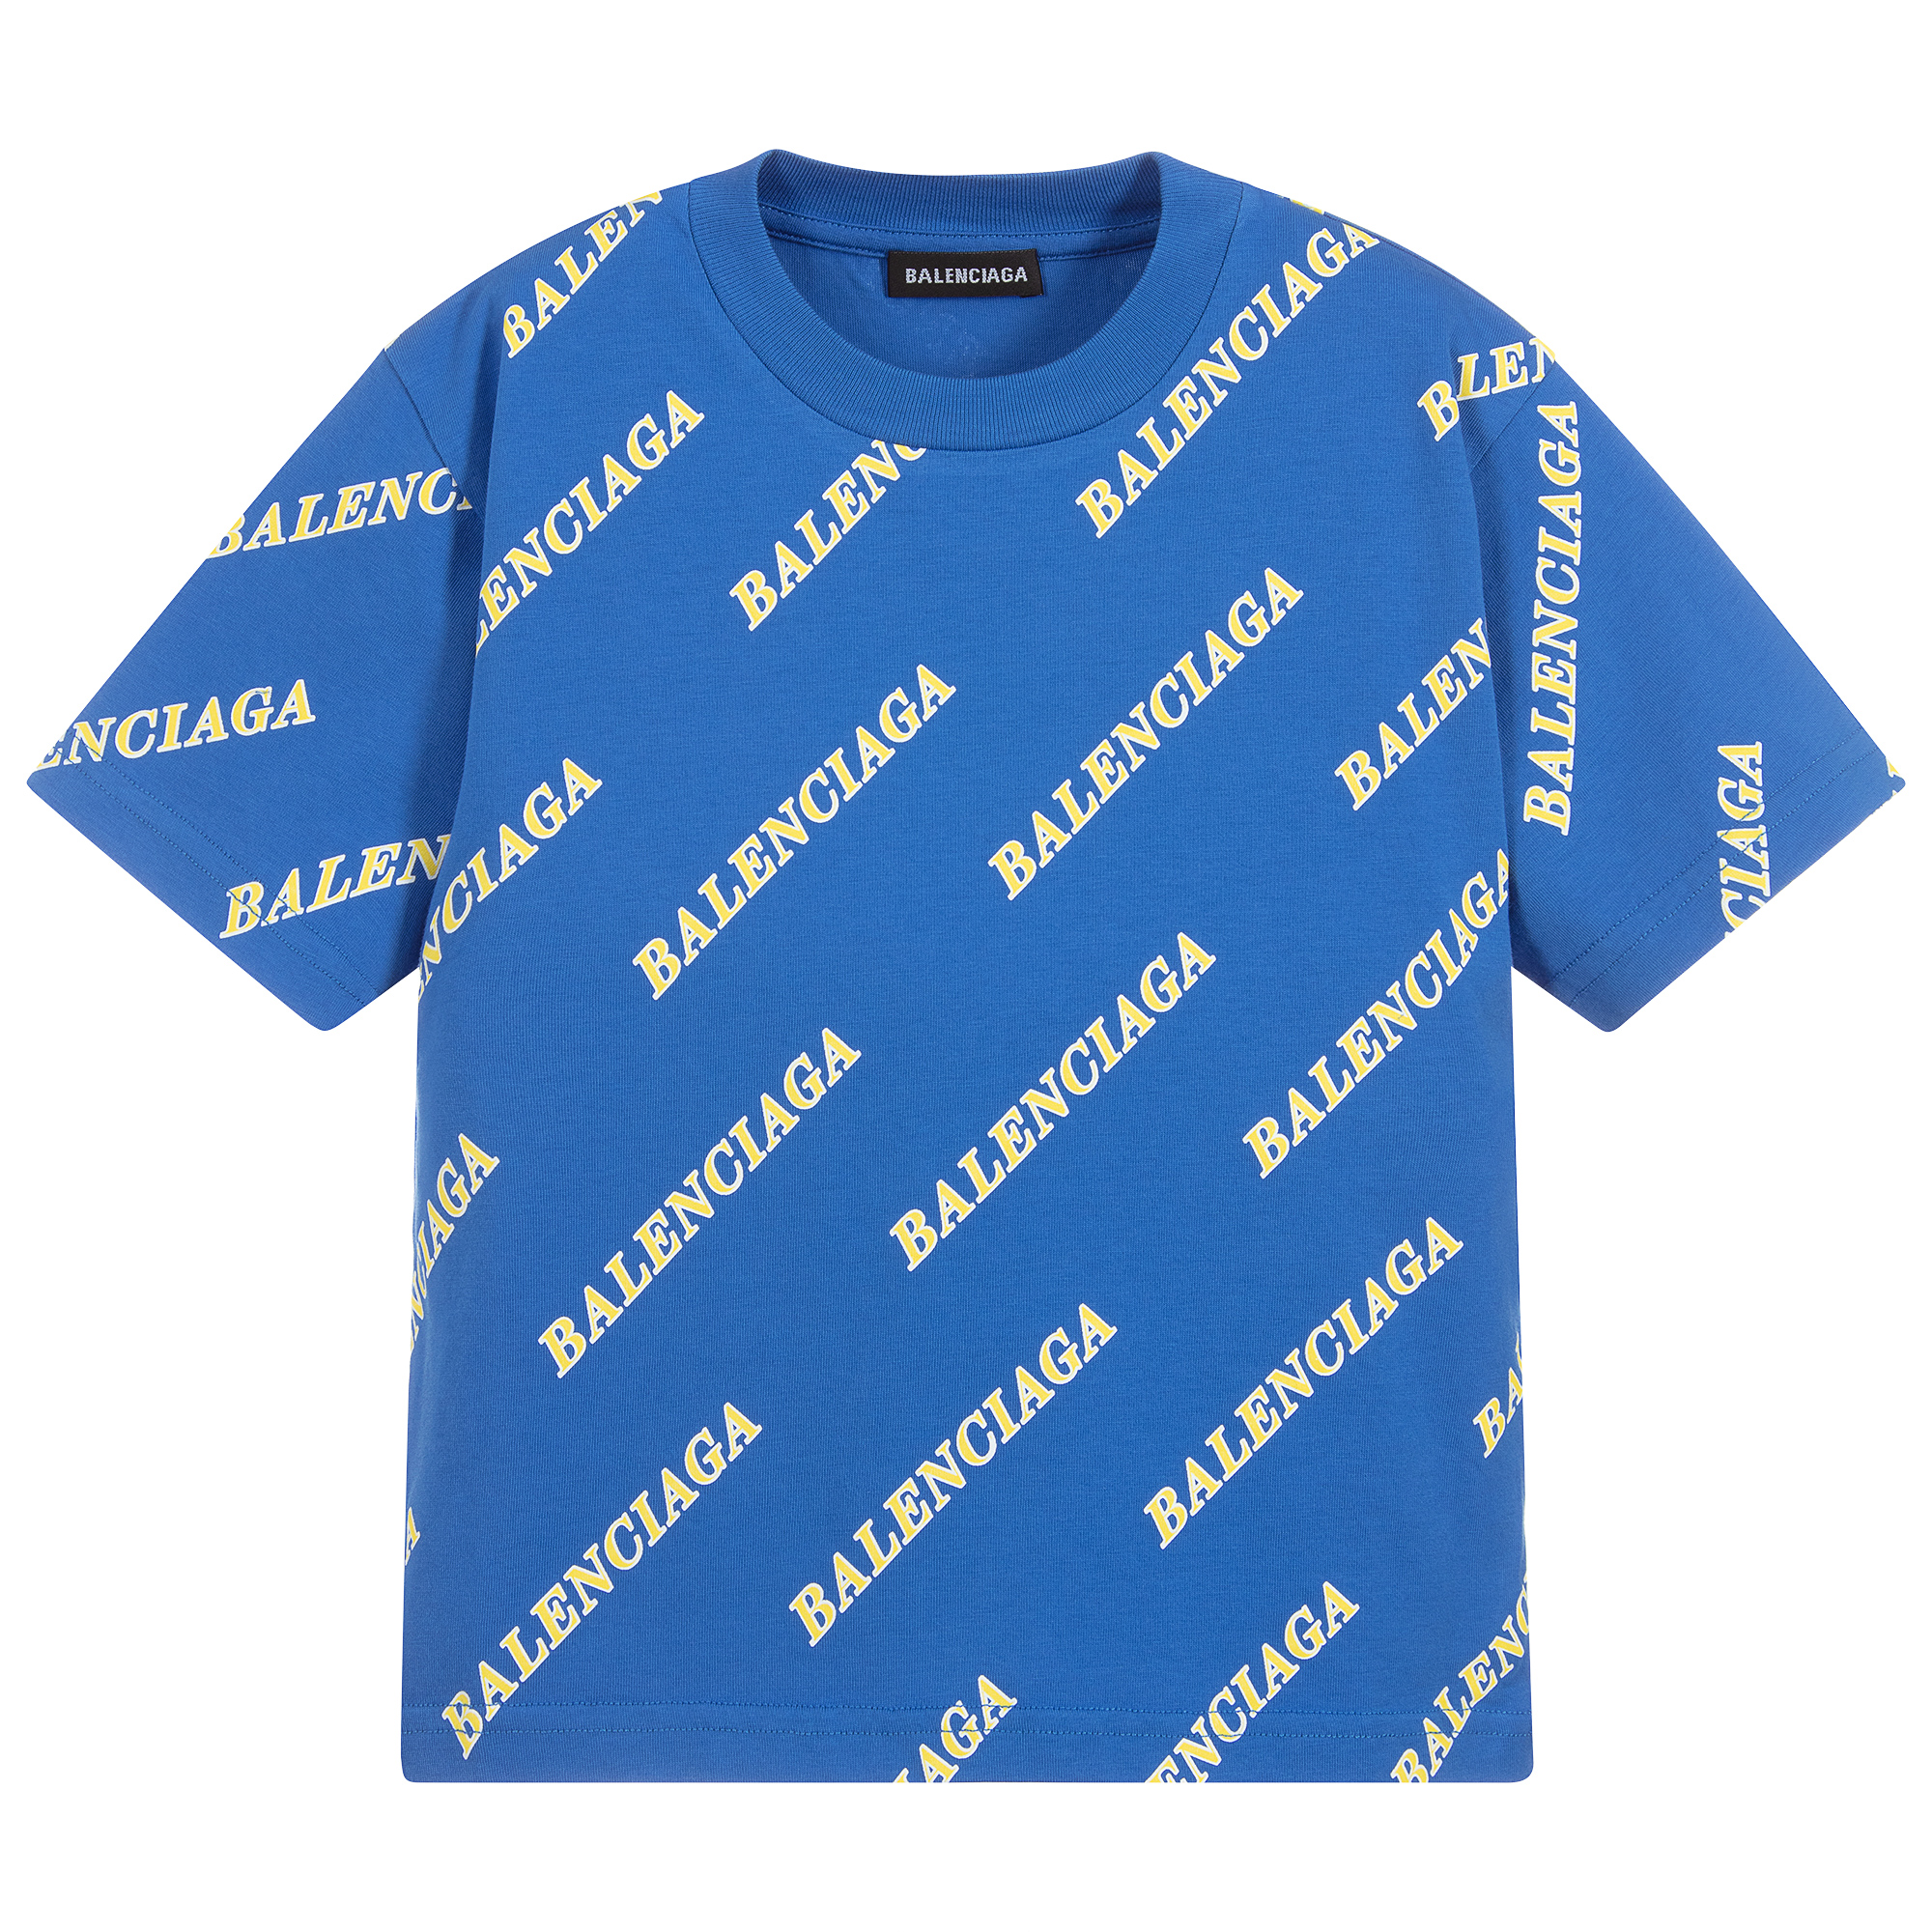 Balenciaga - Blue Logo Printed T-Shirt